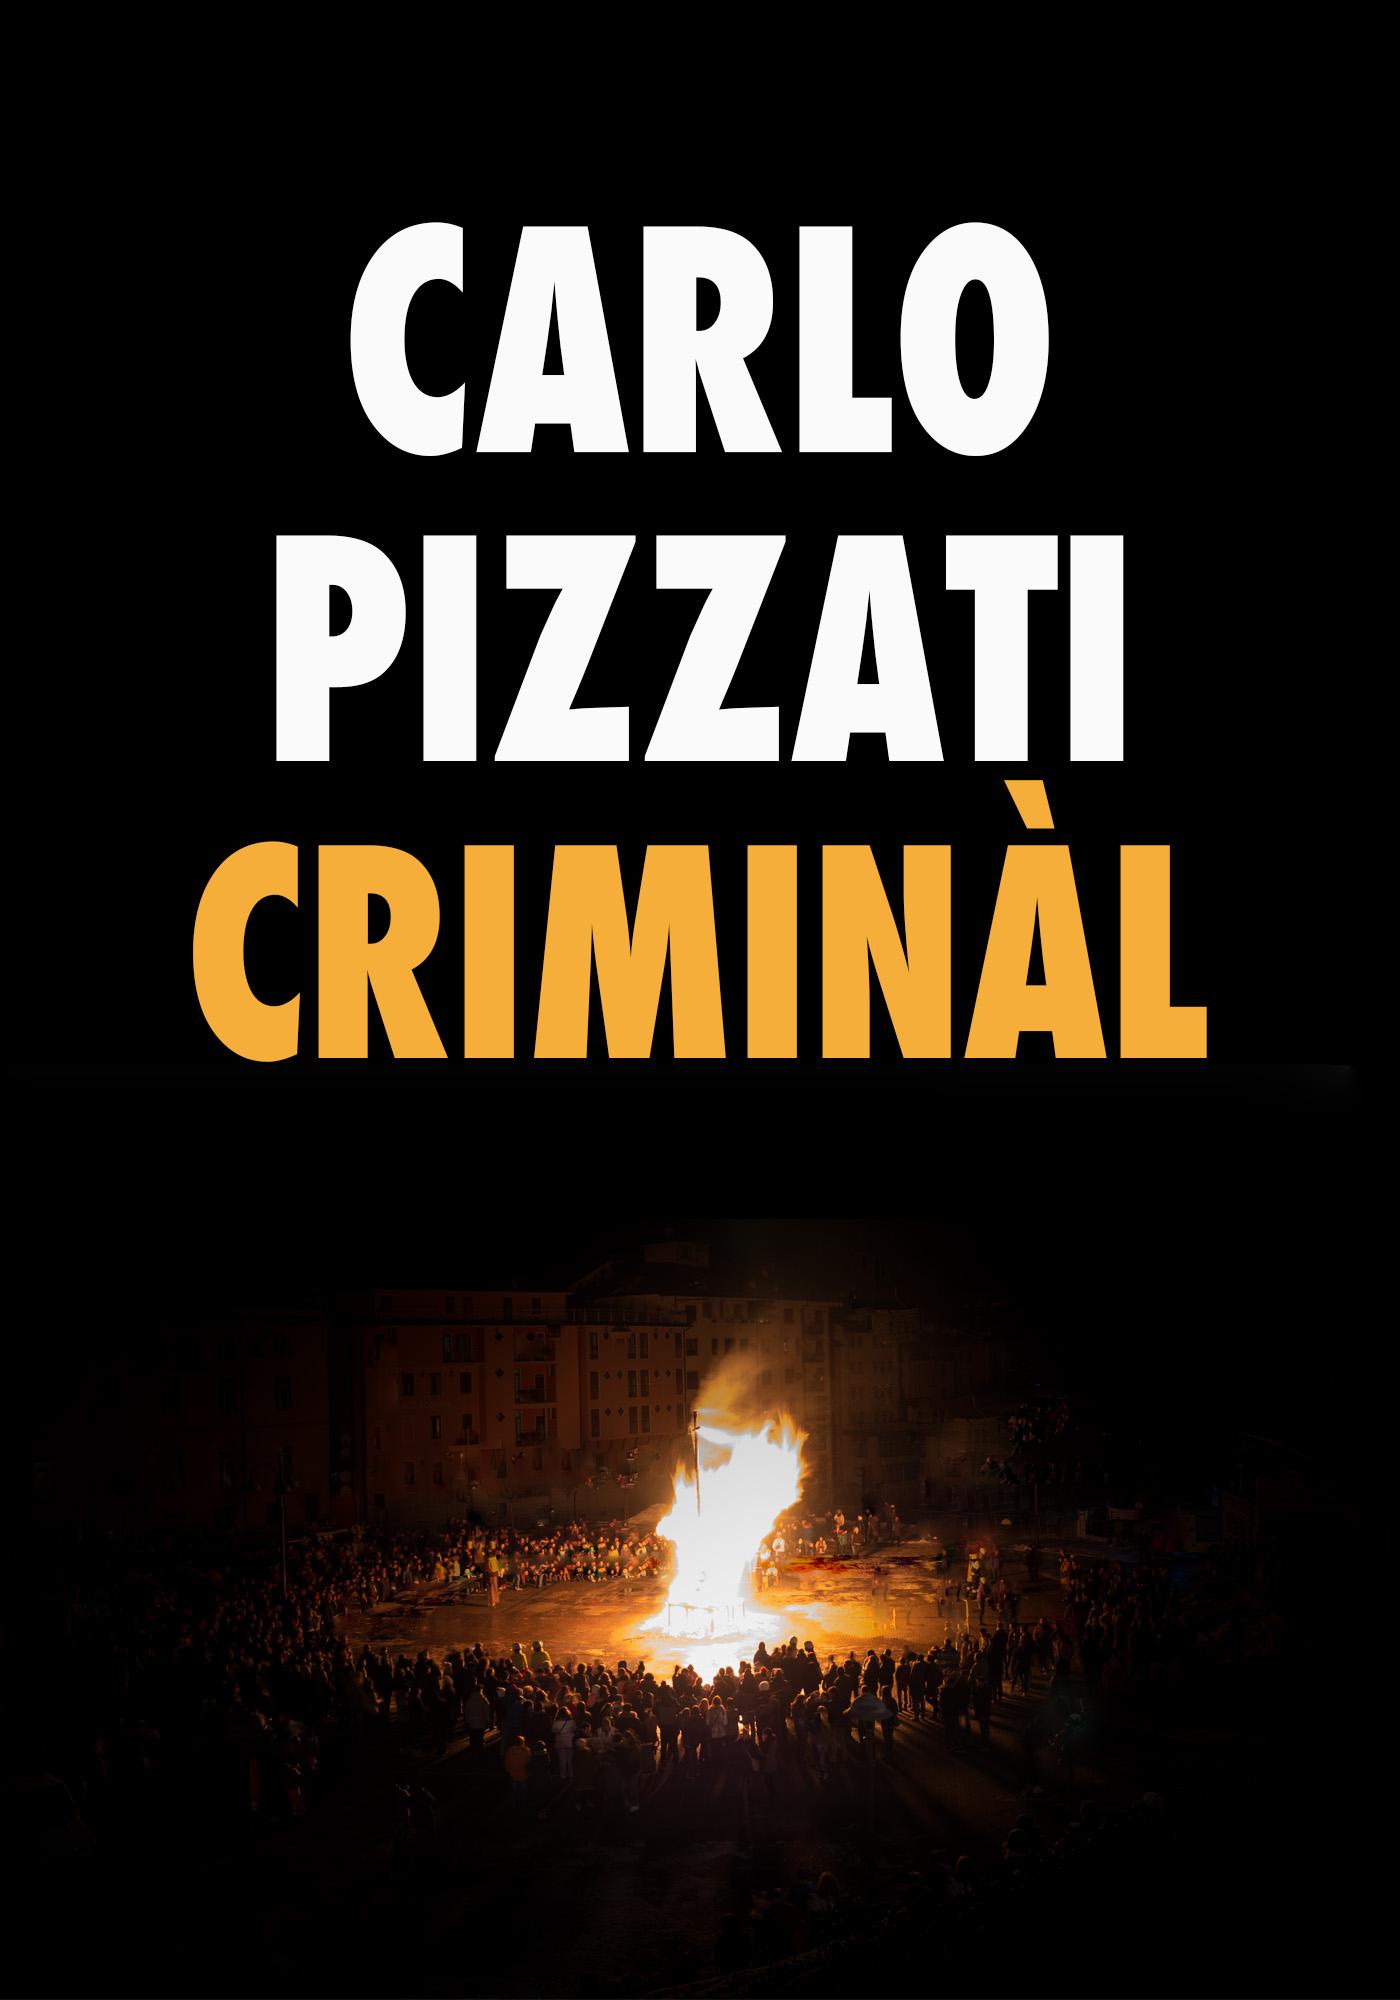 criminal_FUOCO